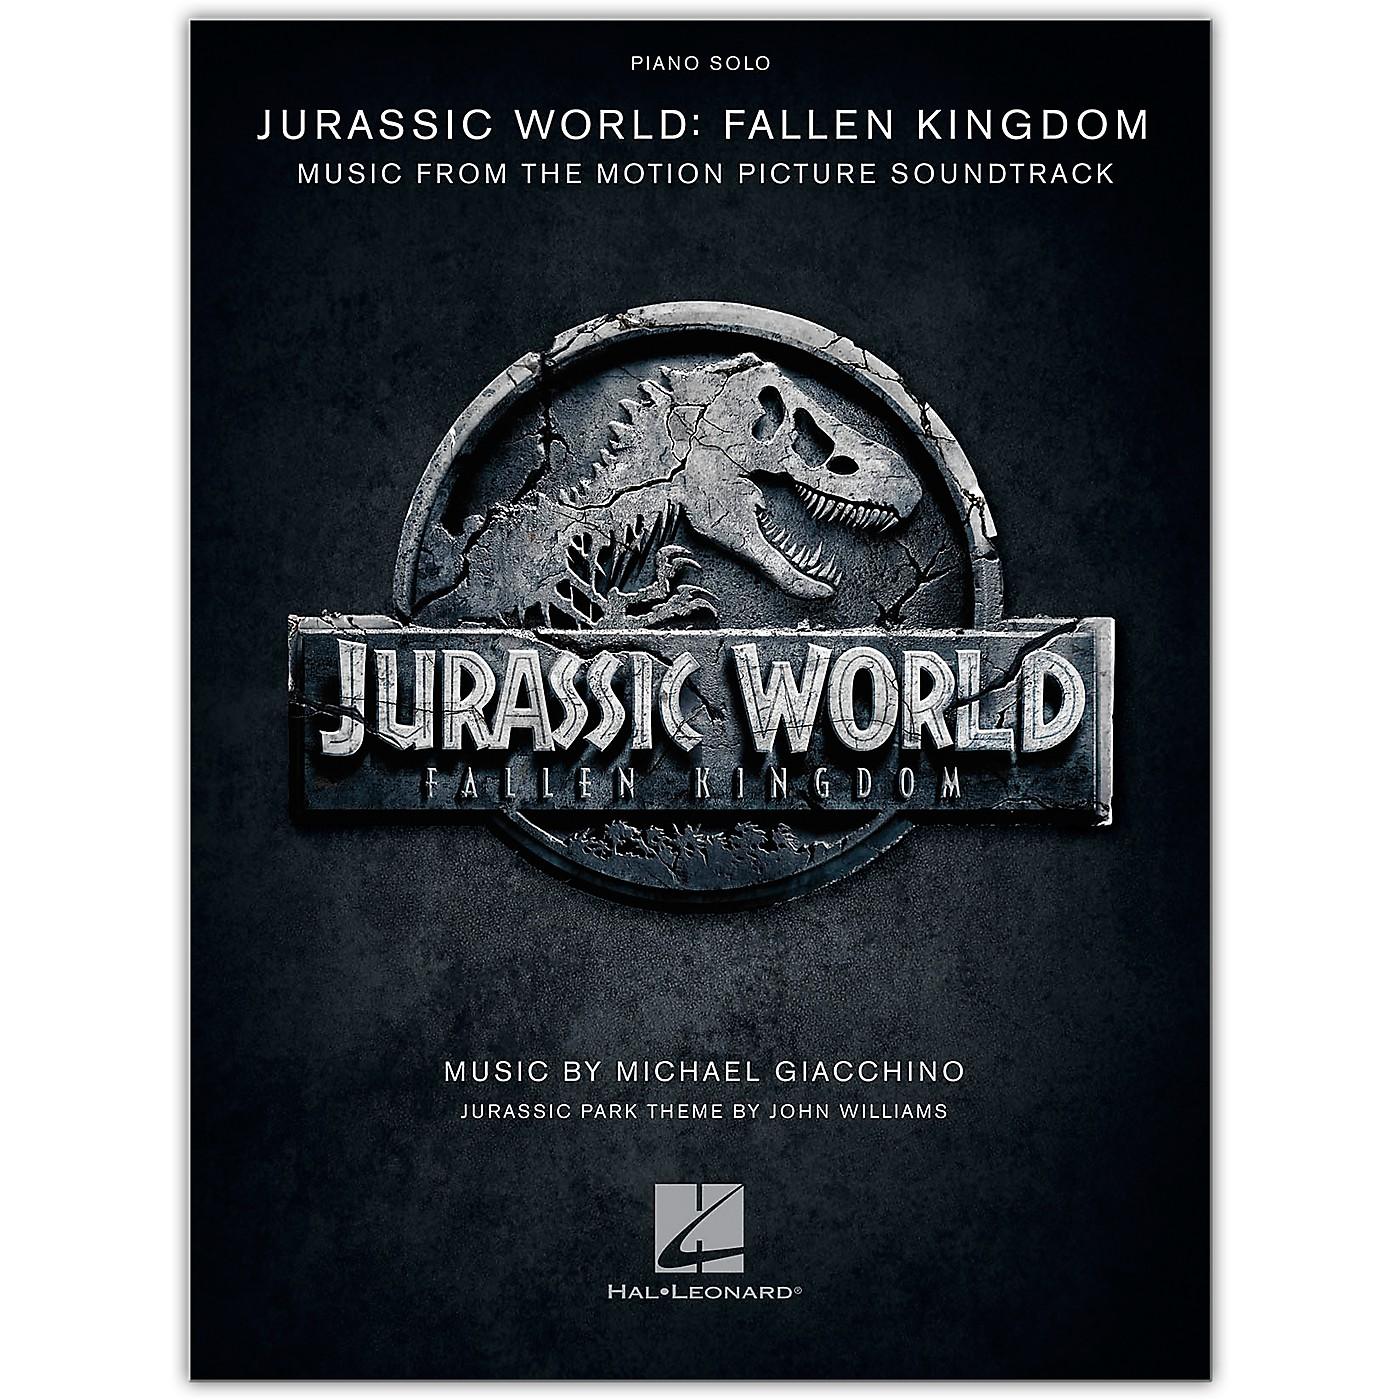 Hal Leonard Jurassic World: Fallen Kingdom Piano Solo thumbnail